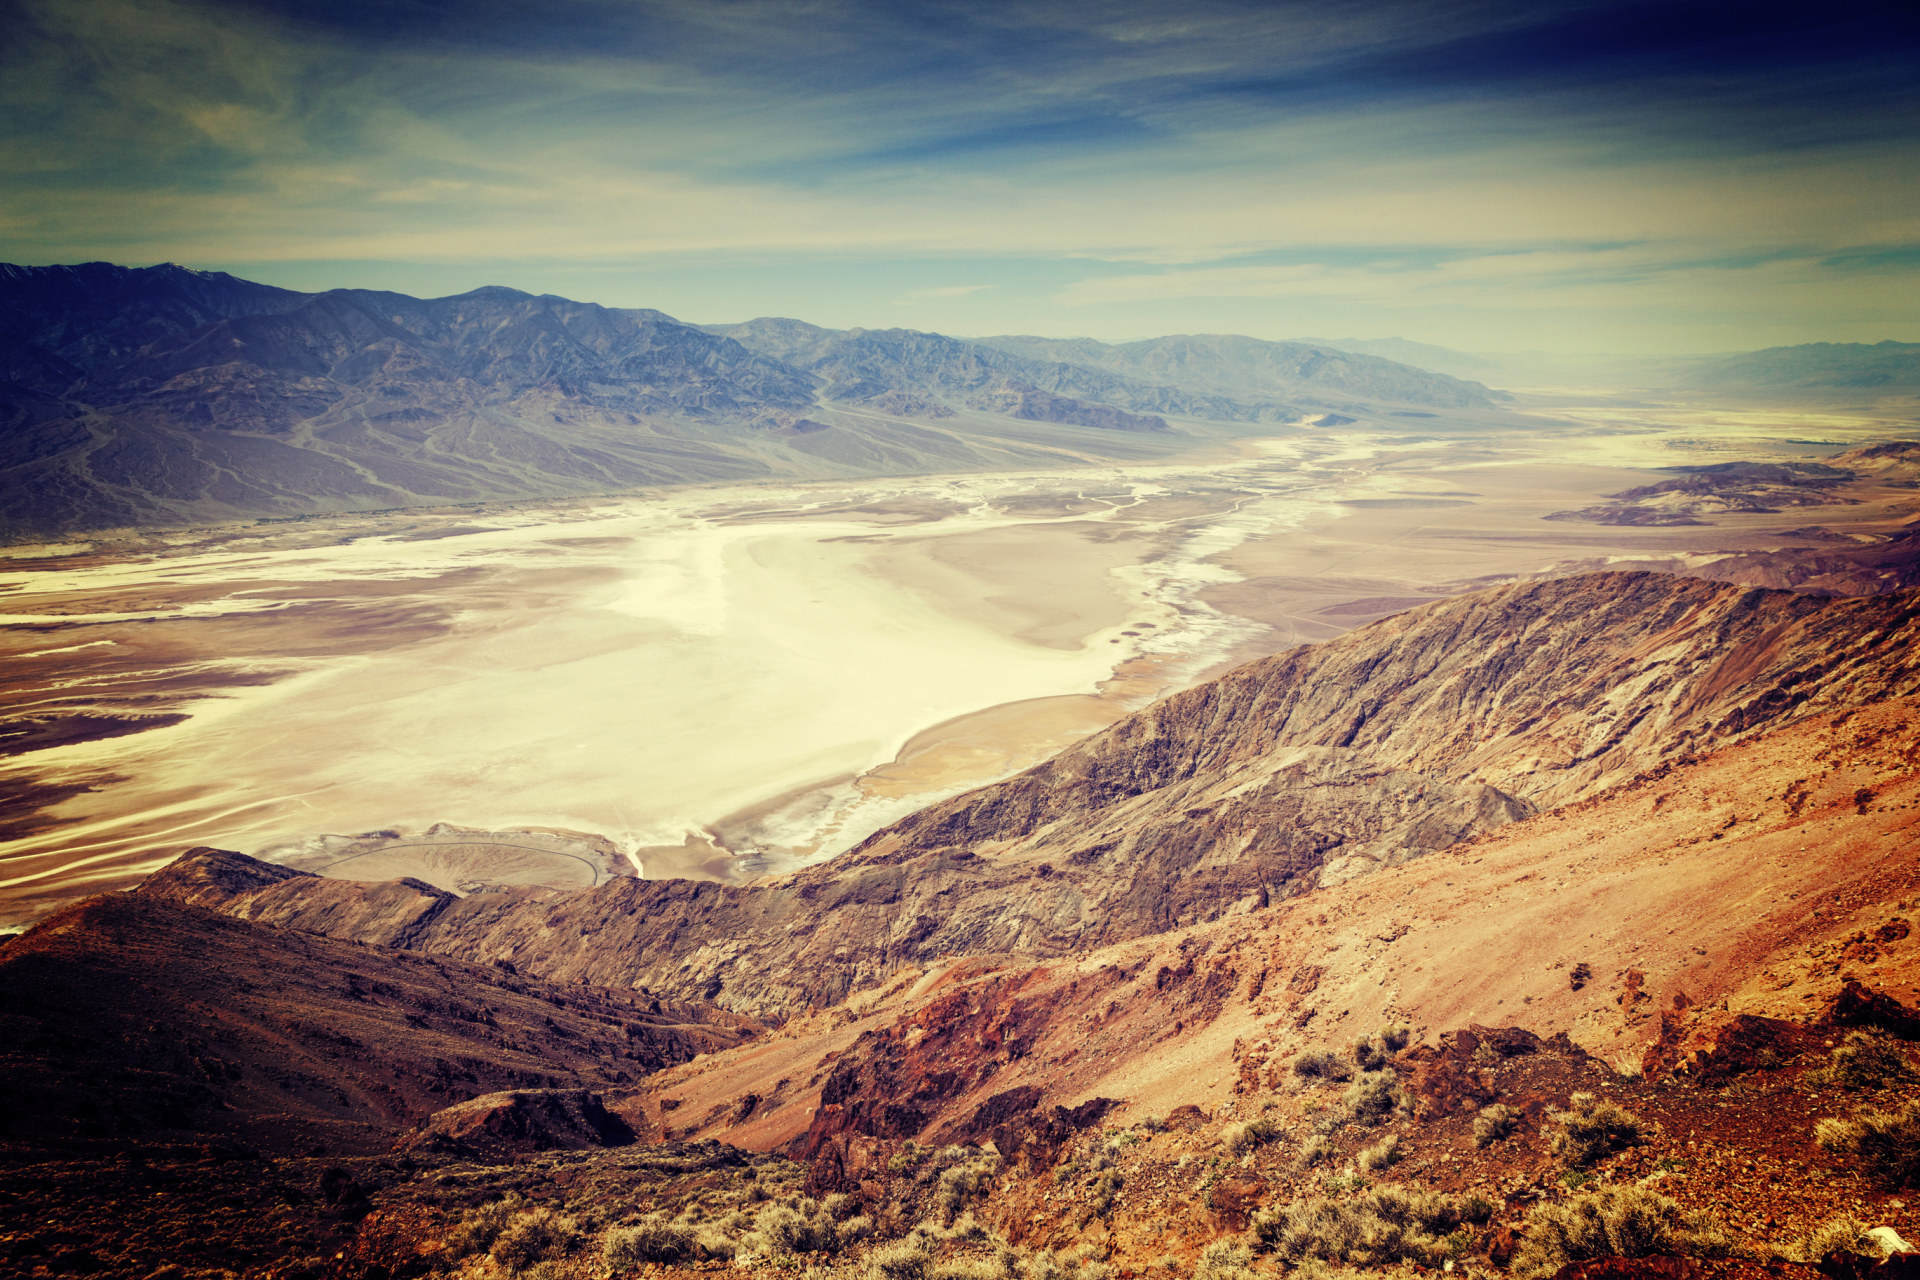 United States, Death Valley